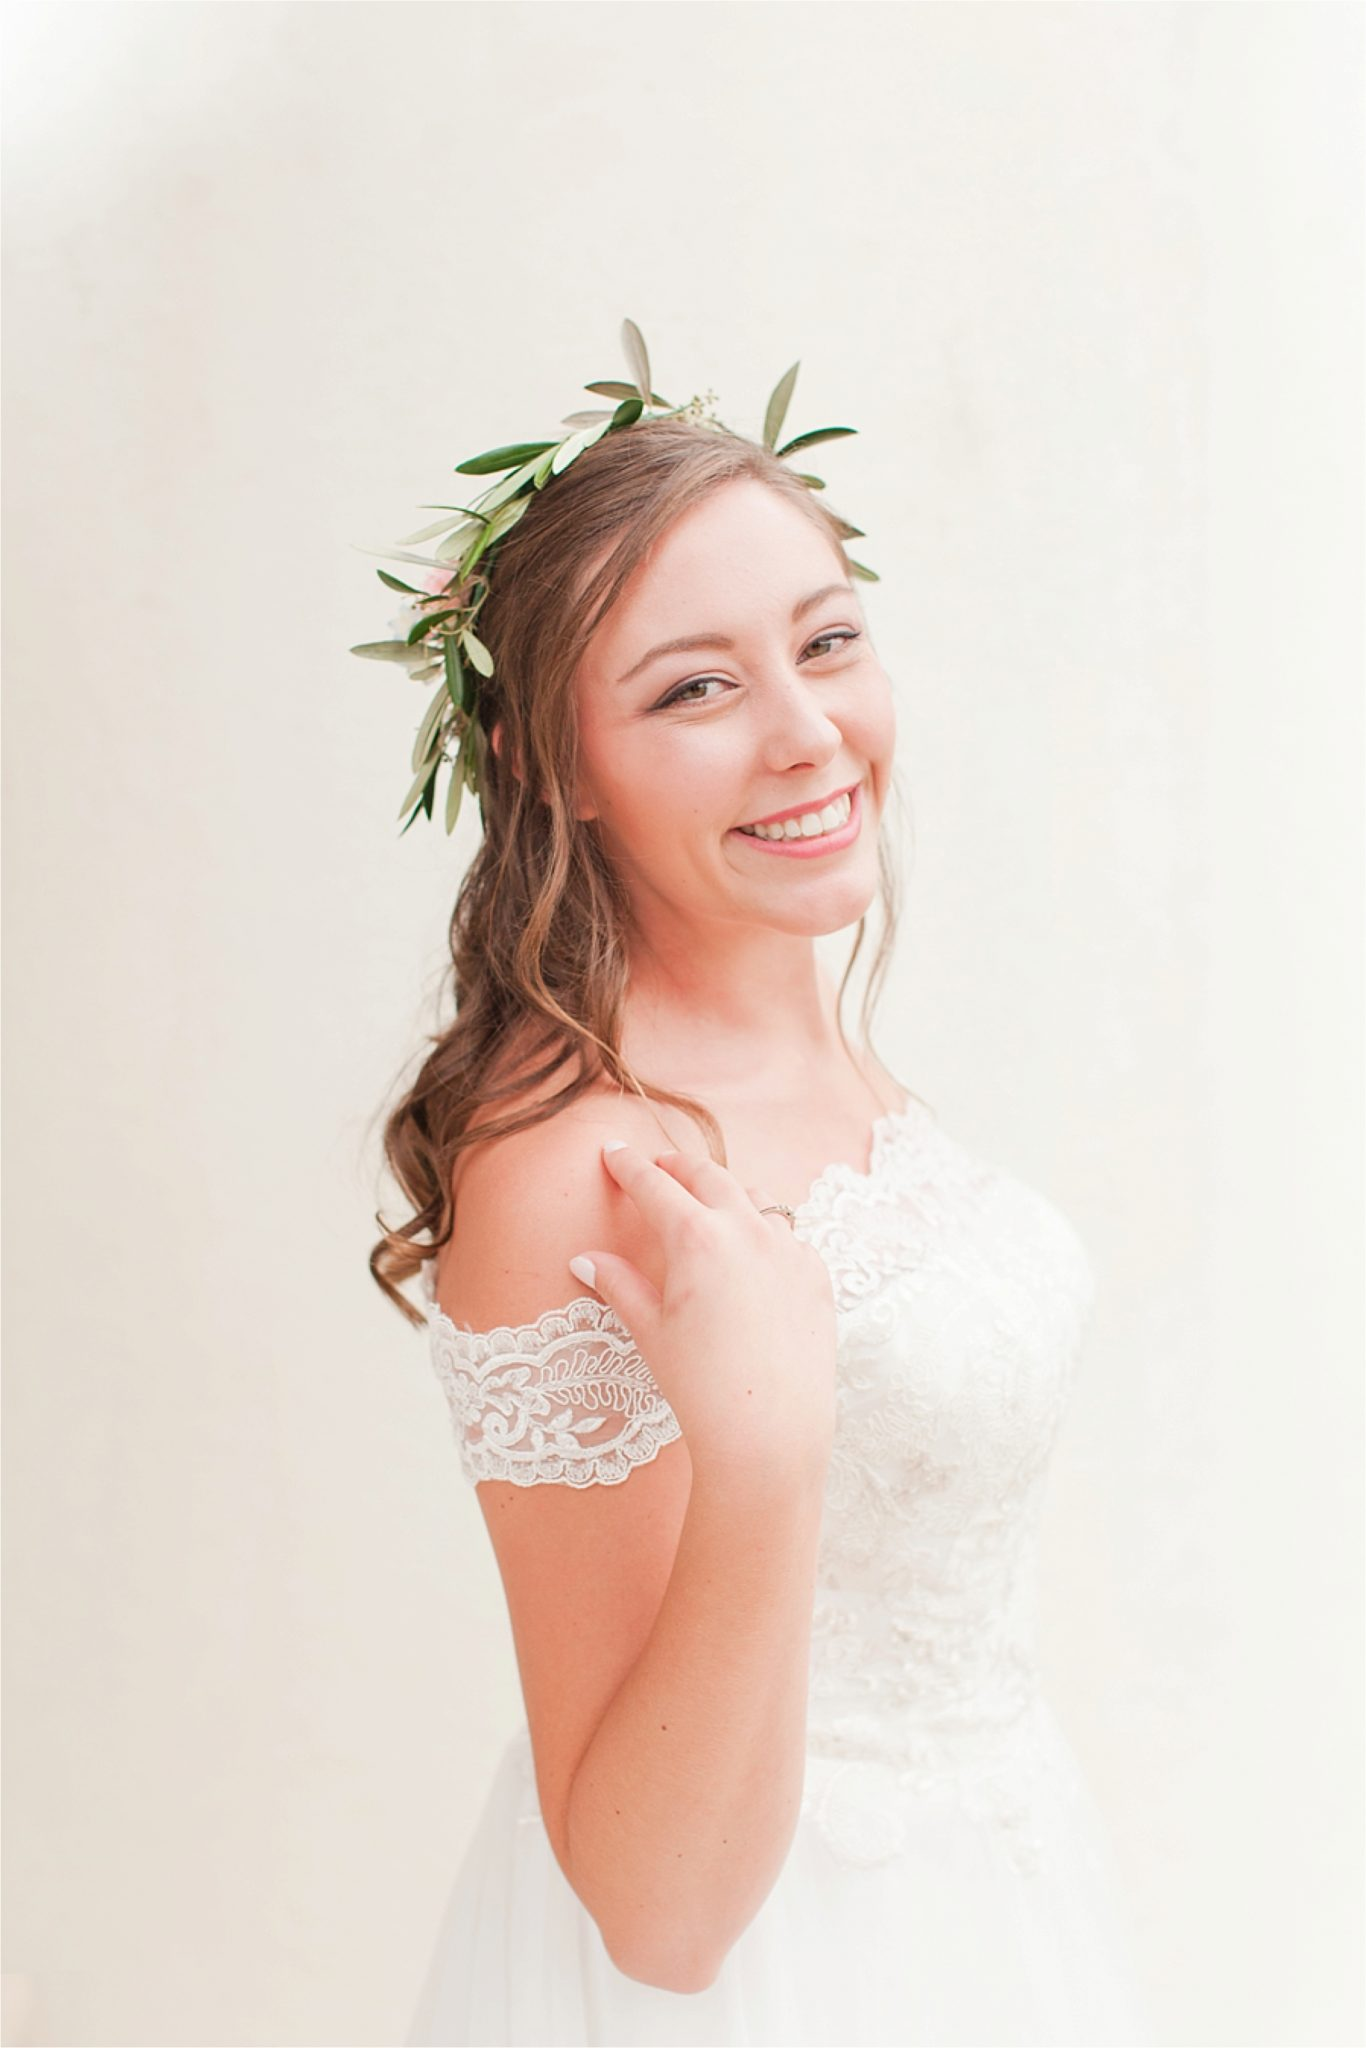 Bridal Portrait Session at Spring Hill College-Byrne Hall-Ginny-Alabama photographer-Wedding bouquet-Bride-Wedding dress-Bridal shoot inspiration